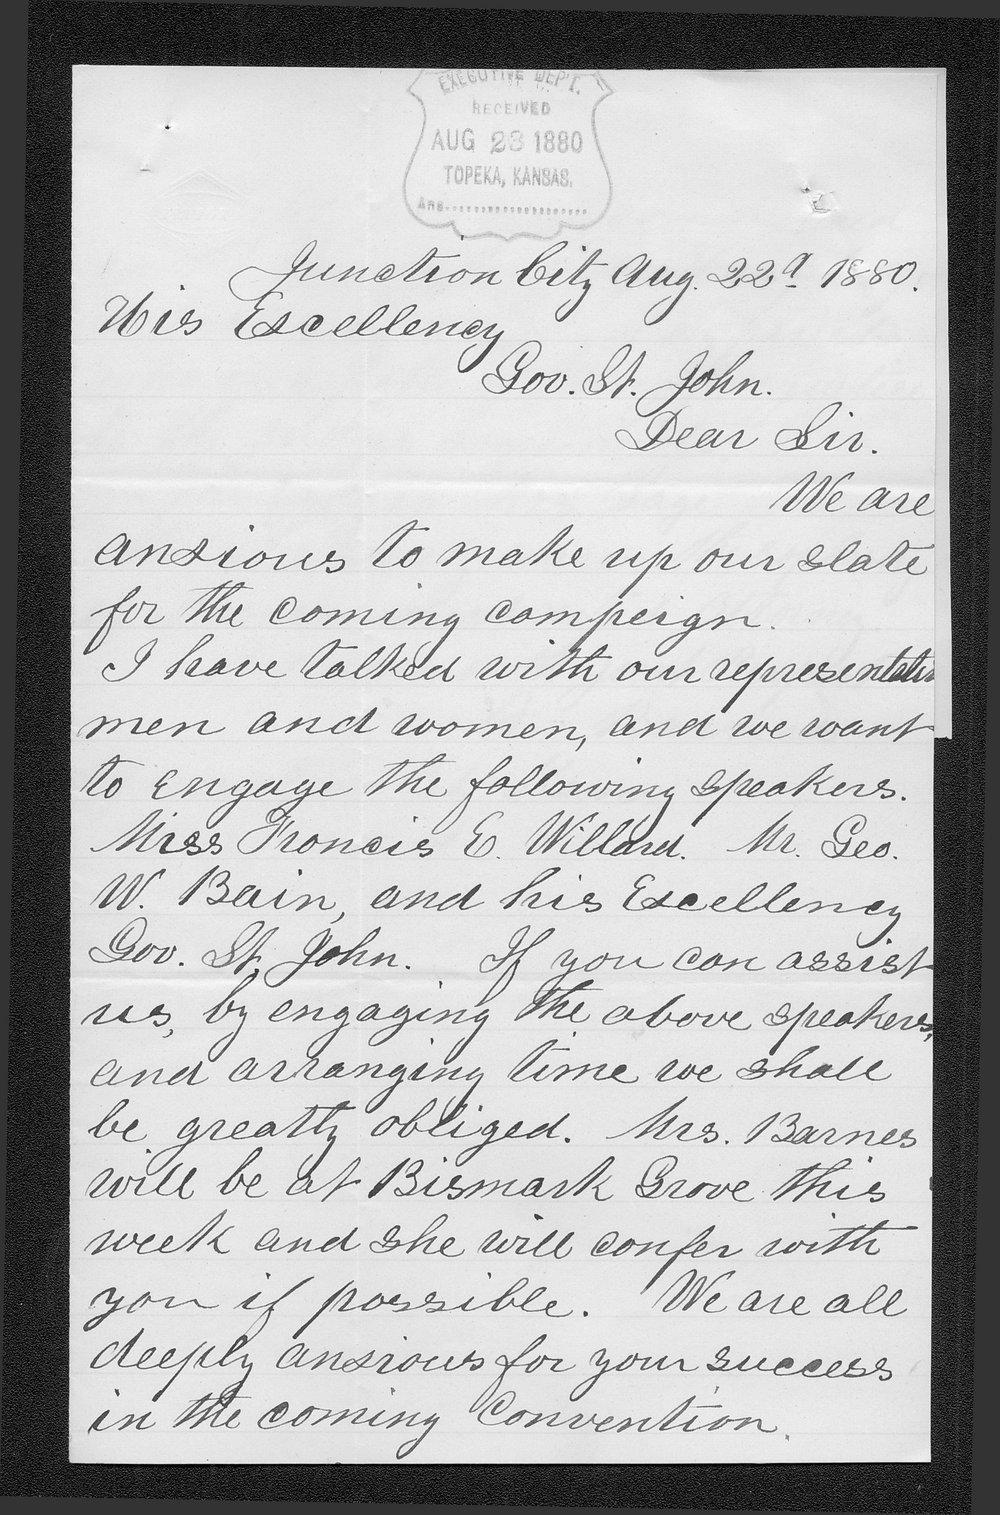 A. Barnes to Governor John St. John - 1